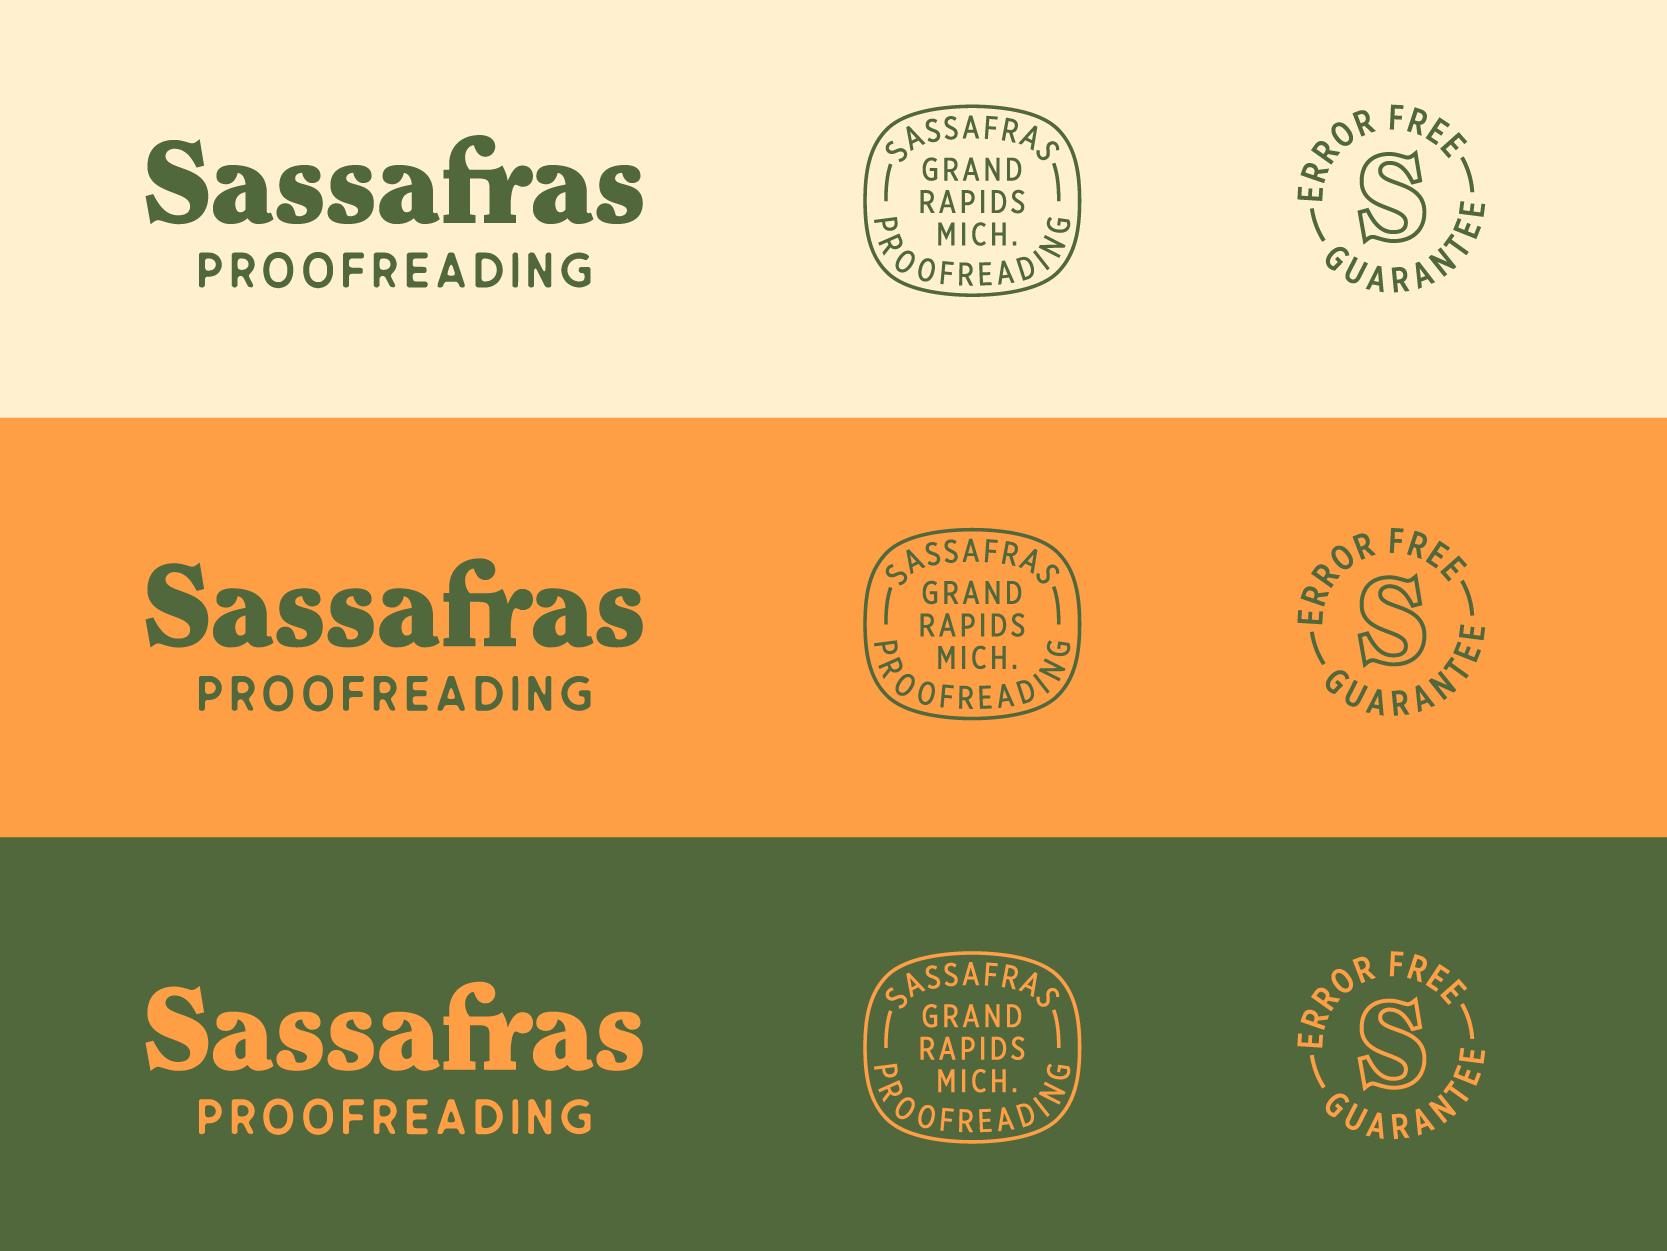 SASSAFRAS-03.png